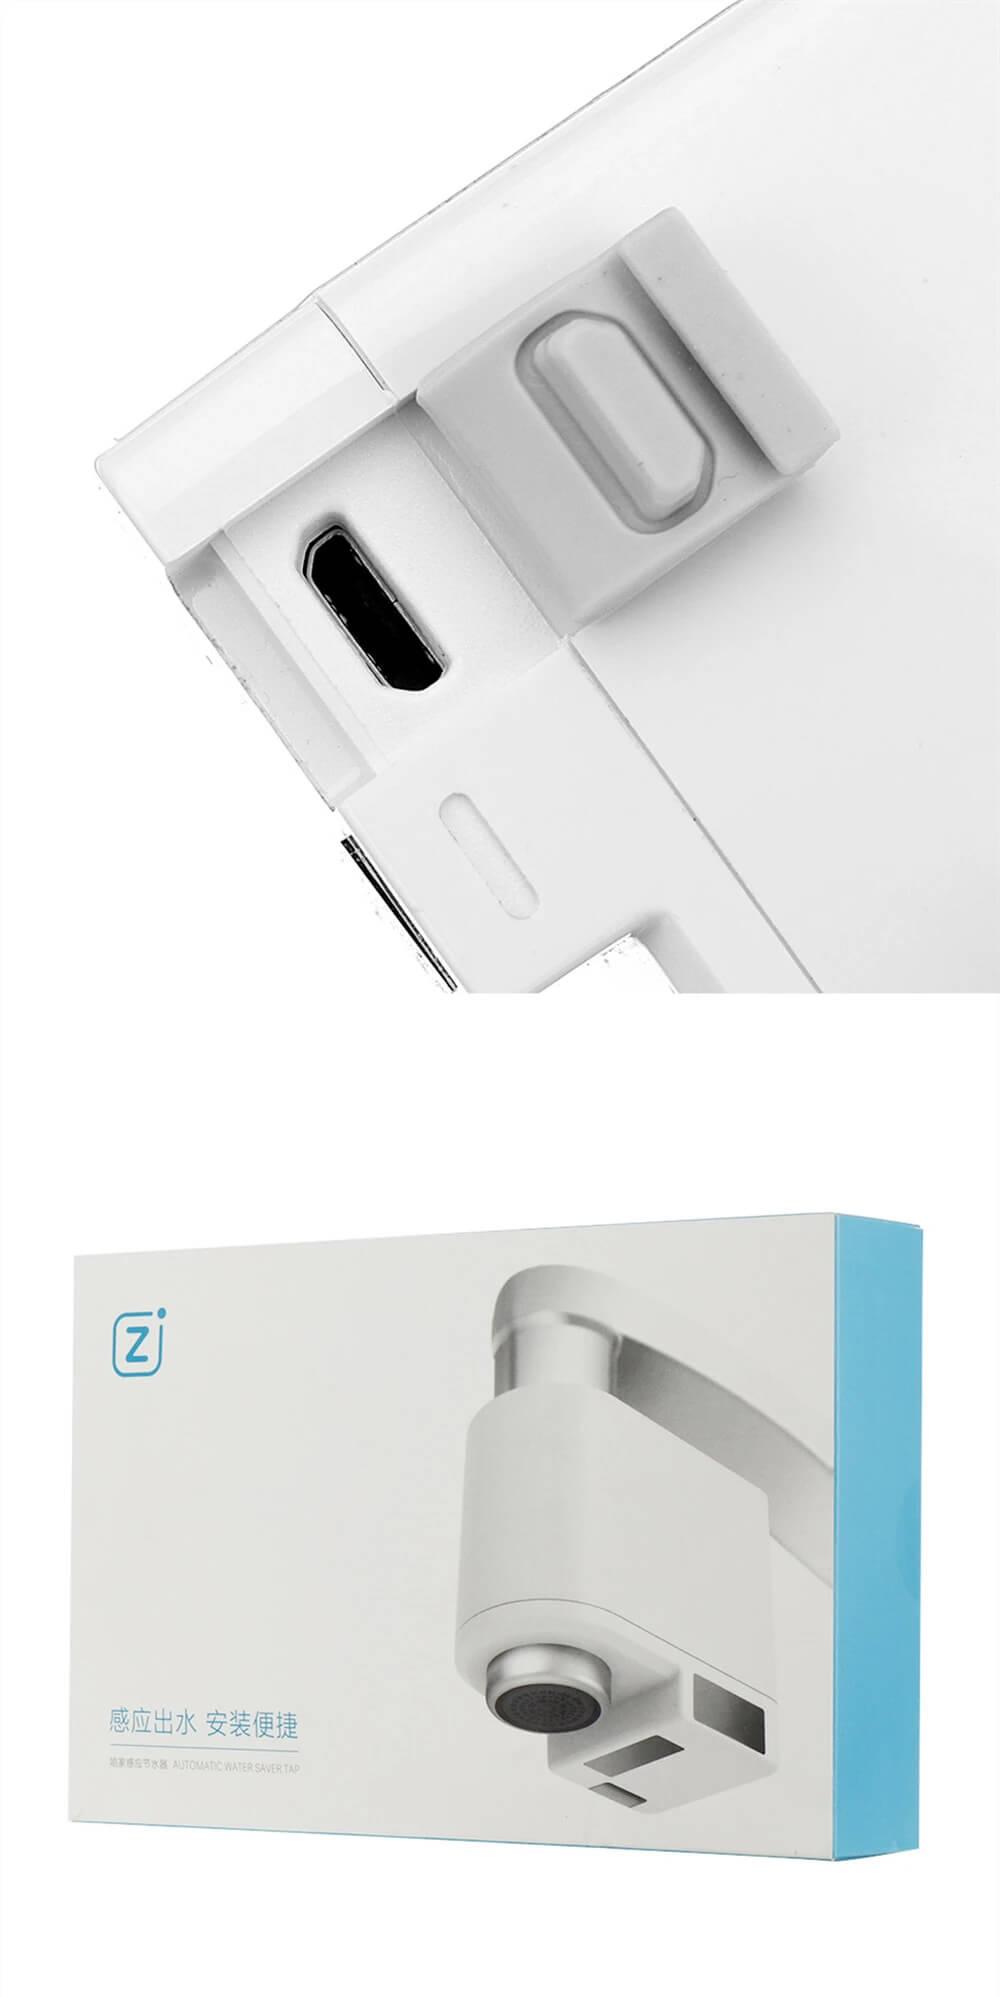 سرشیر آب هوشمند شیائومی مدل HD-ZNJSQ-02